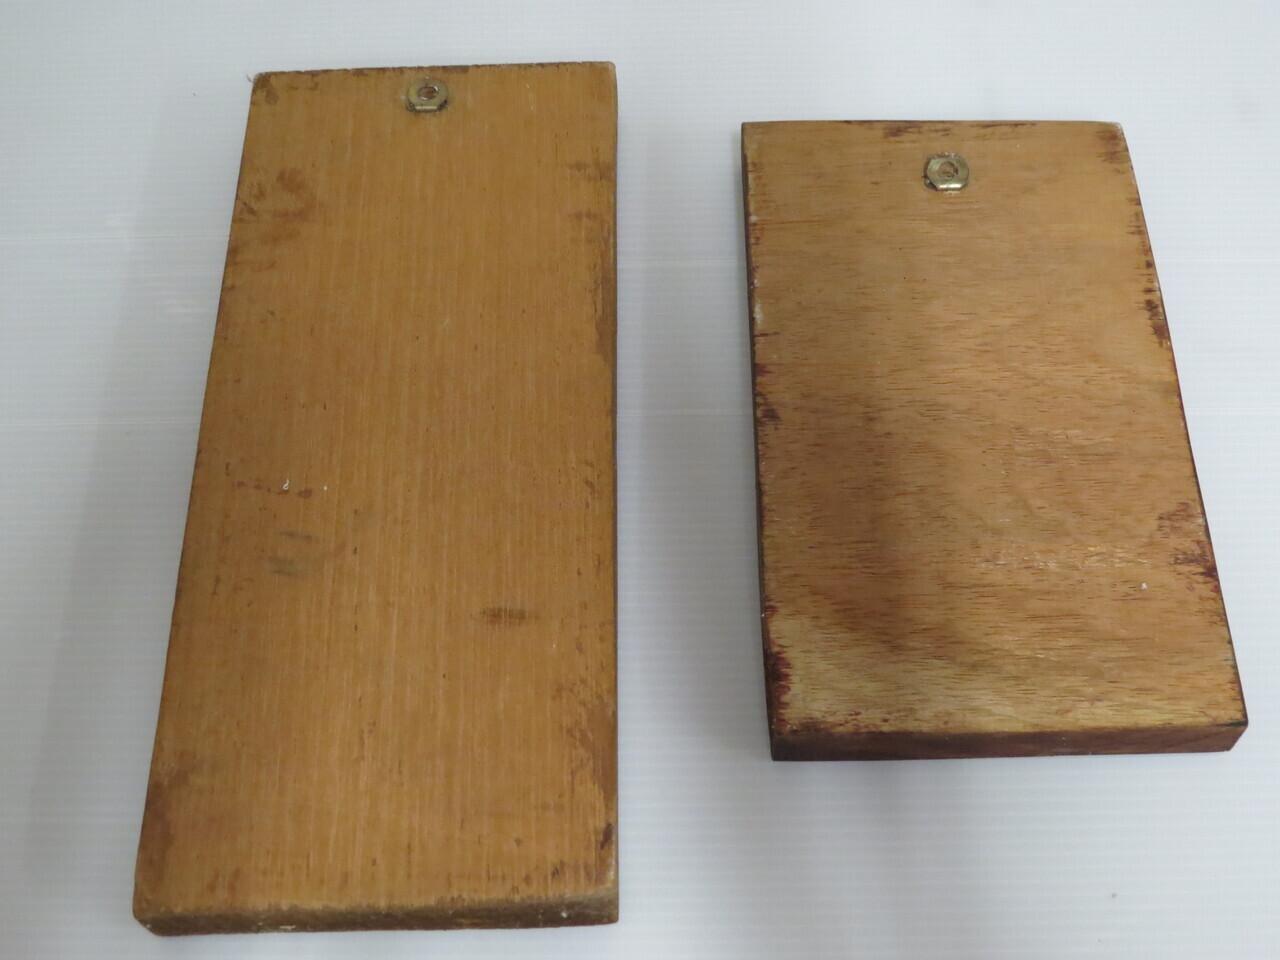 Lote: 30 - Lote: 30 - 2 cuadros en madera